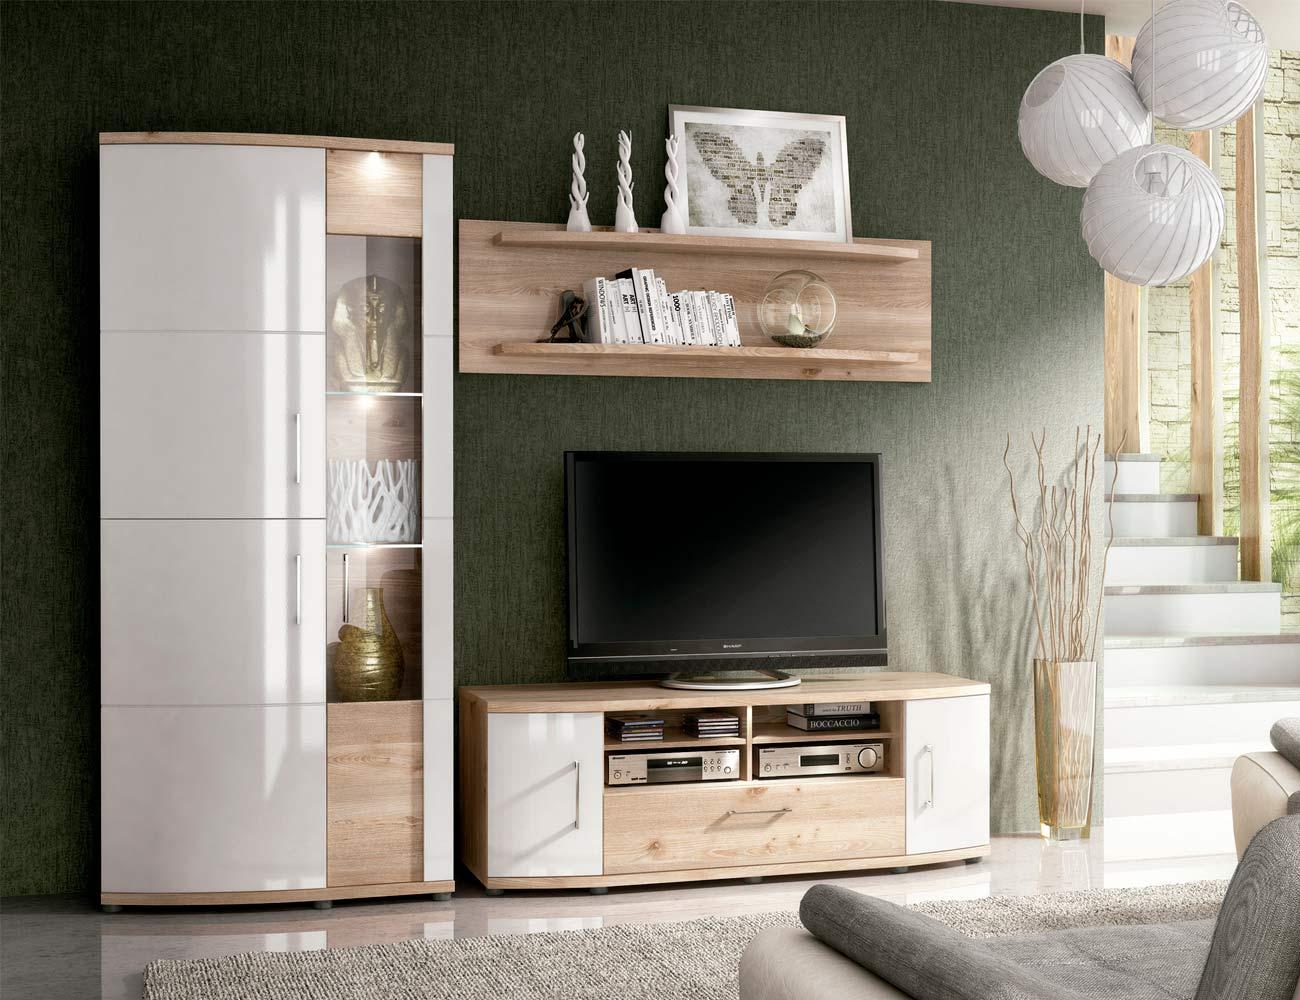 Ambiente2 mueble salon comedor vitrina bodeguero bajo tv nelson blanco